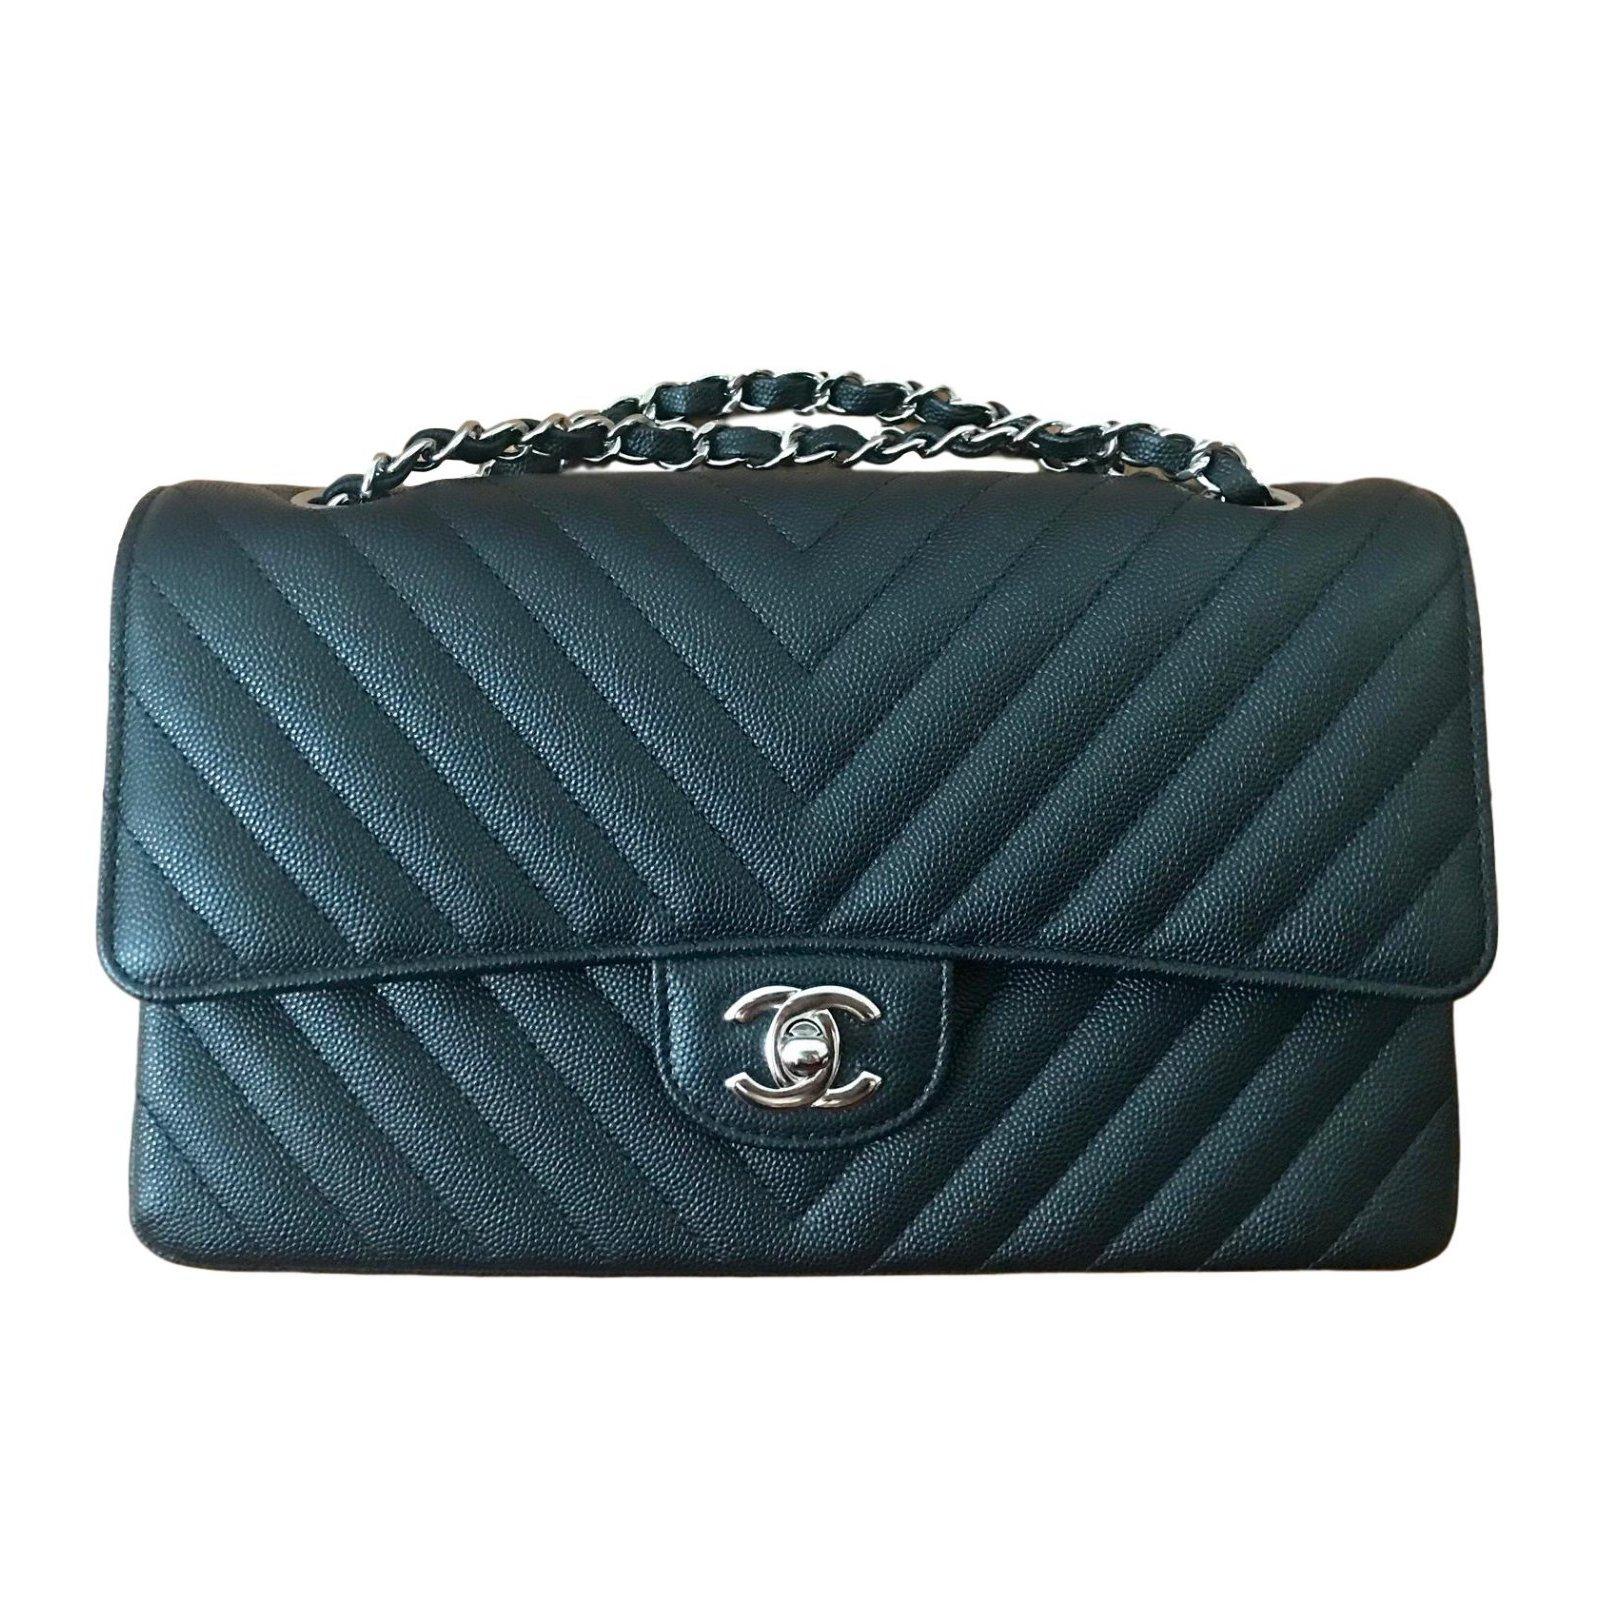 Chanel Handbags Leather Black Ref 76627